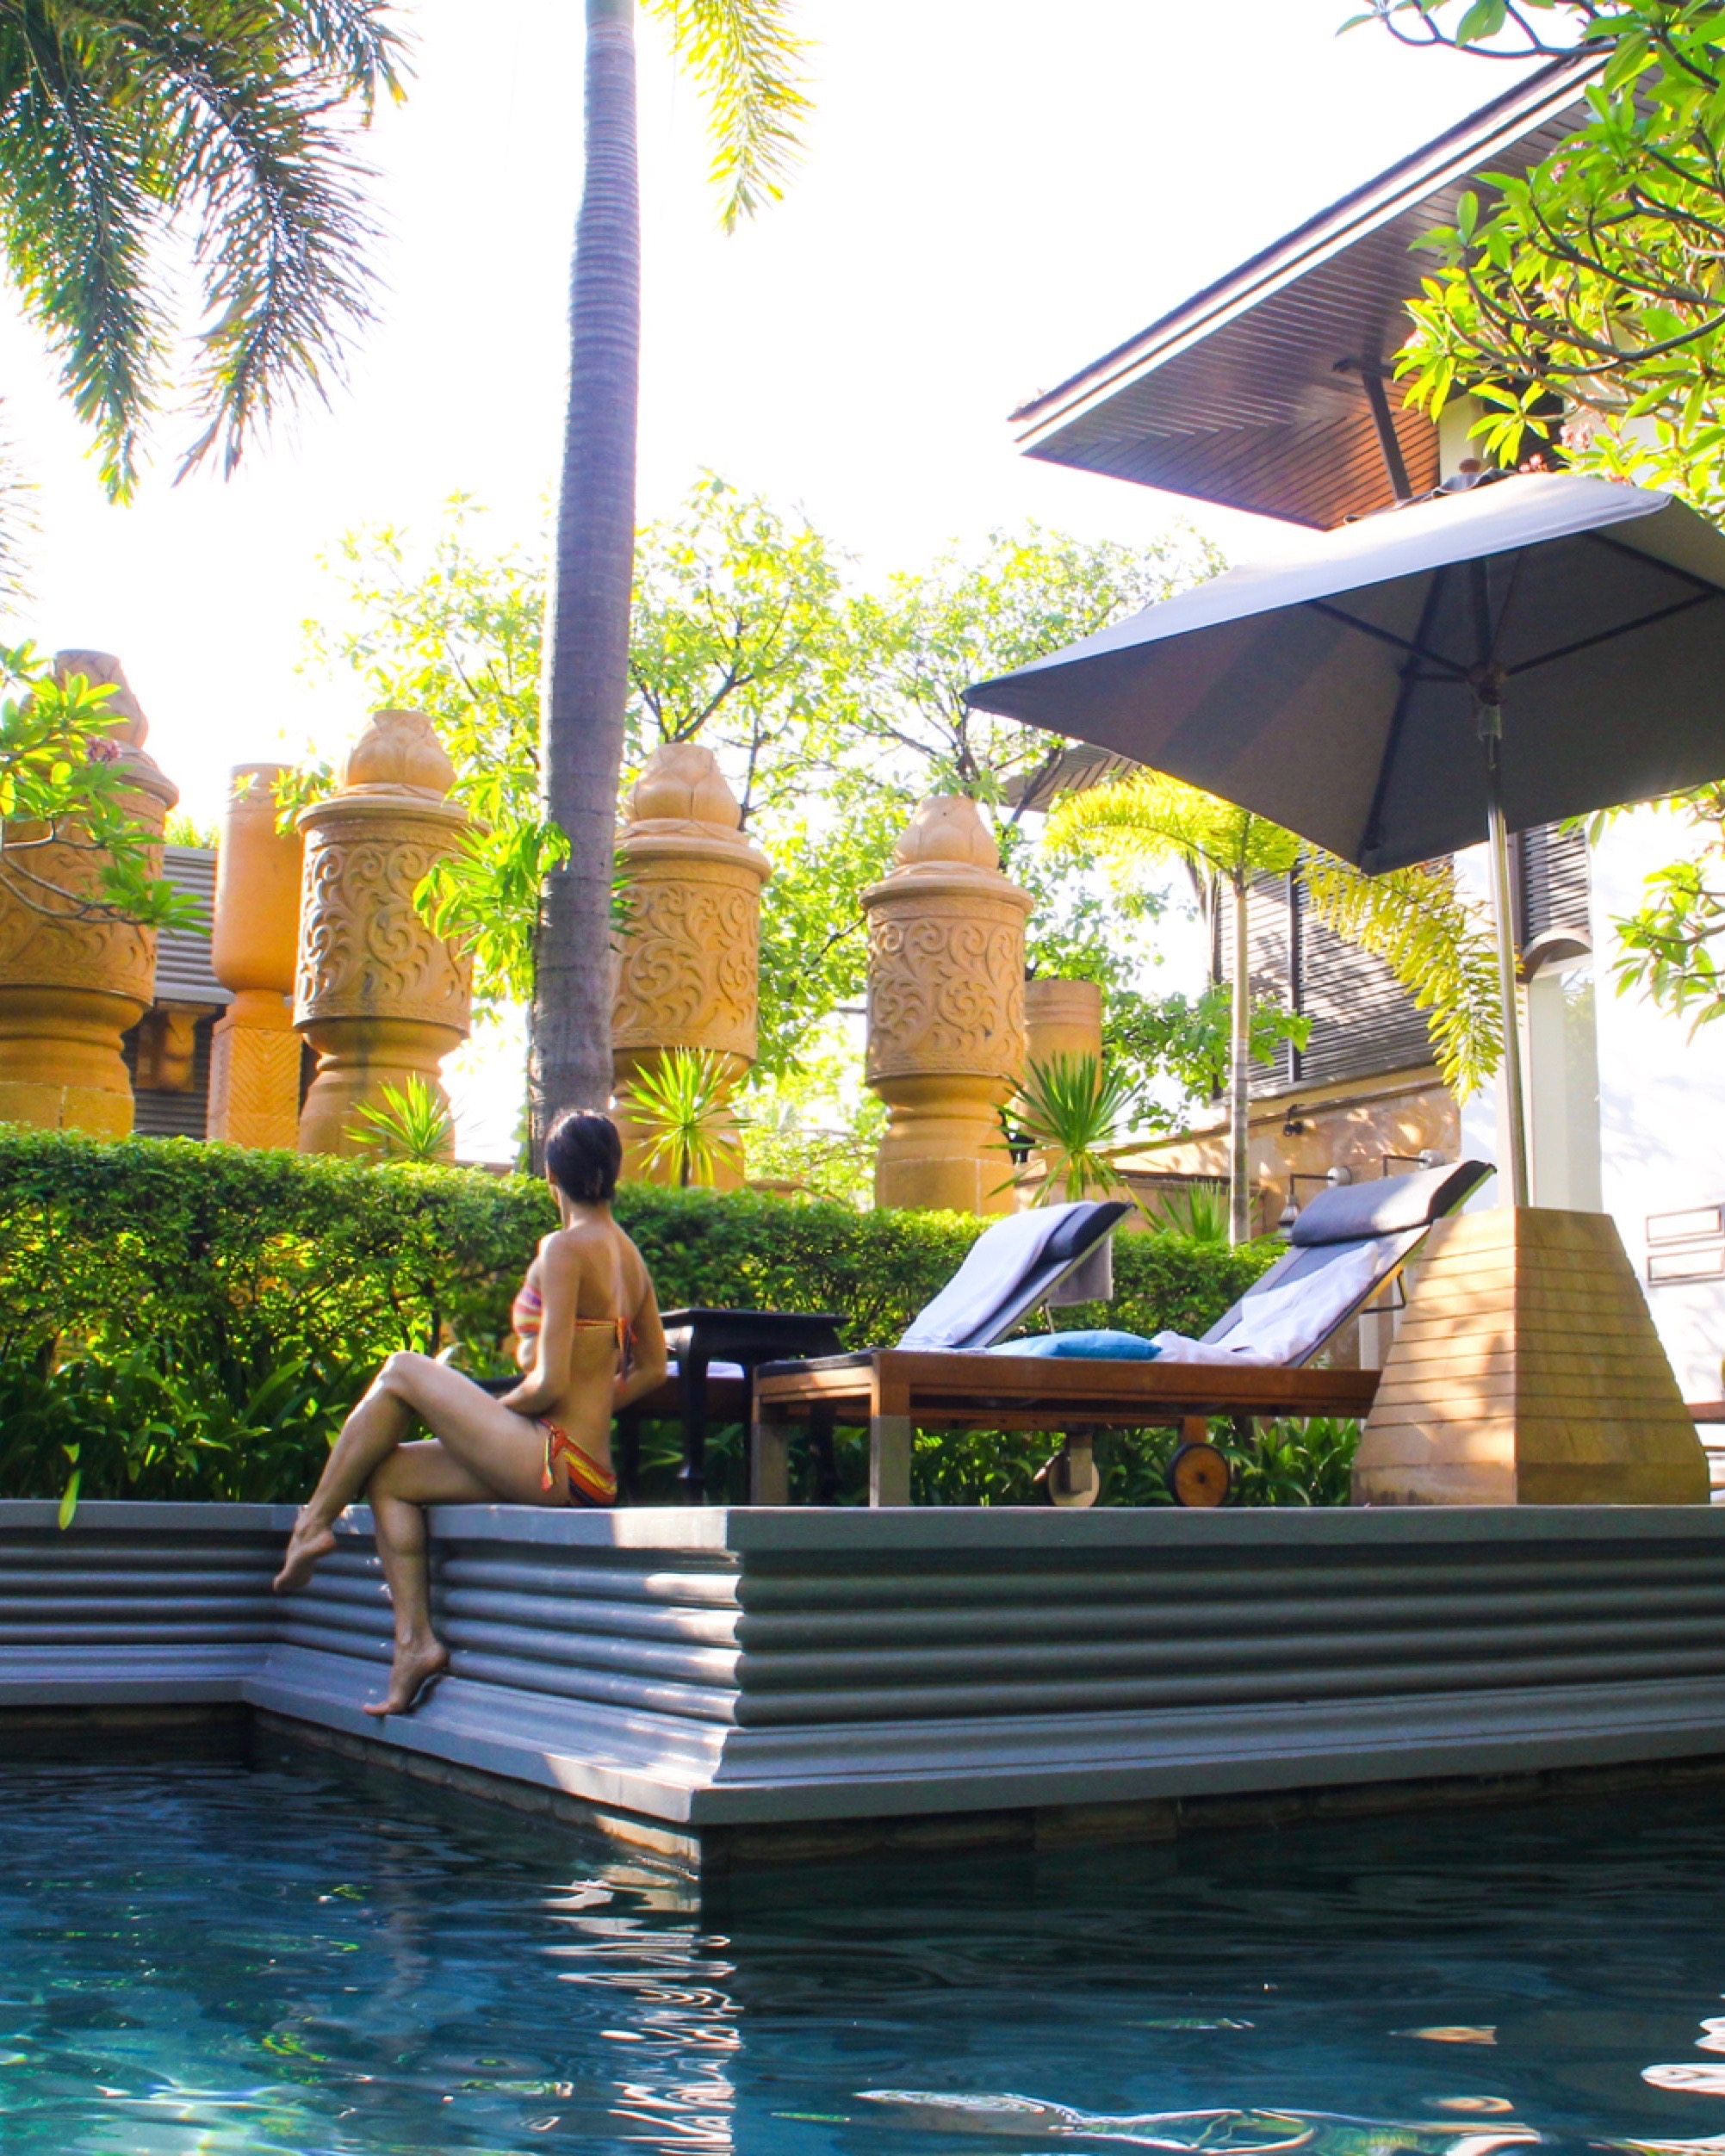 Park Hyatt, Sim Reap, Cambodia